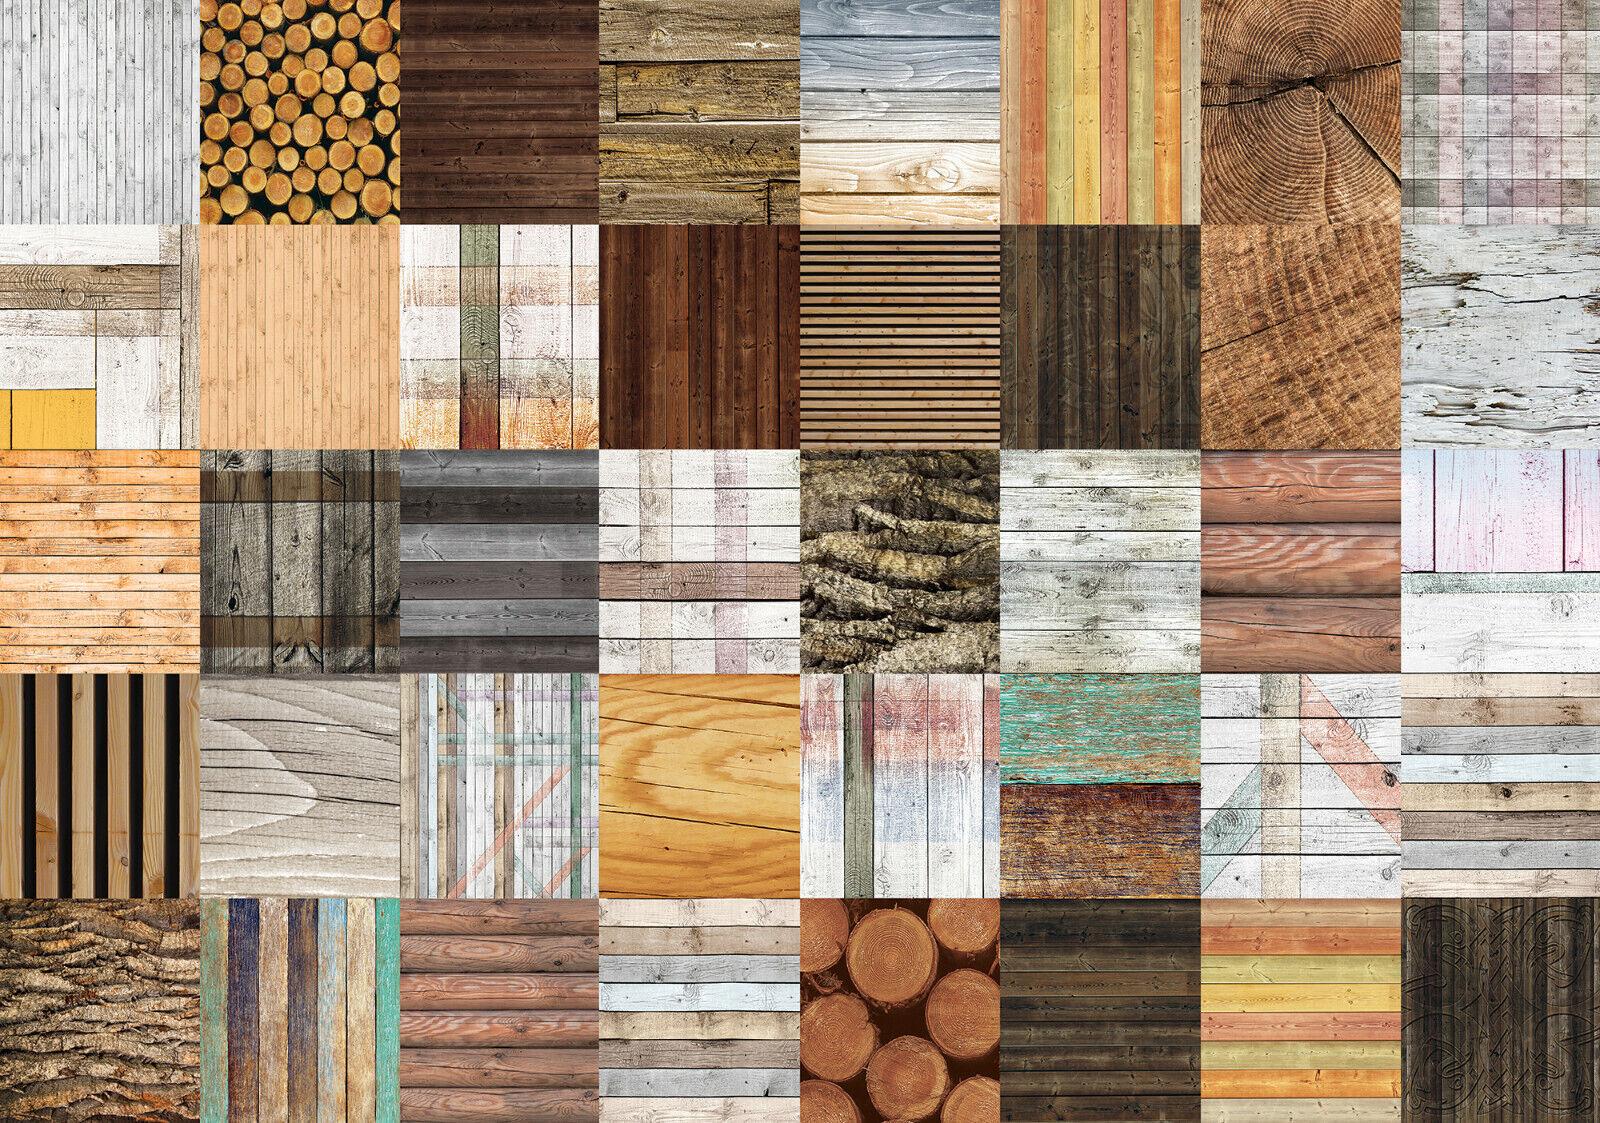 VLIES Fototapete-ABSTRAKT DESIGN-(2619)-Holz-Wand Collage Optik Muster Dekor